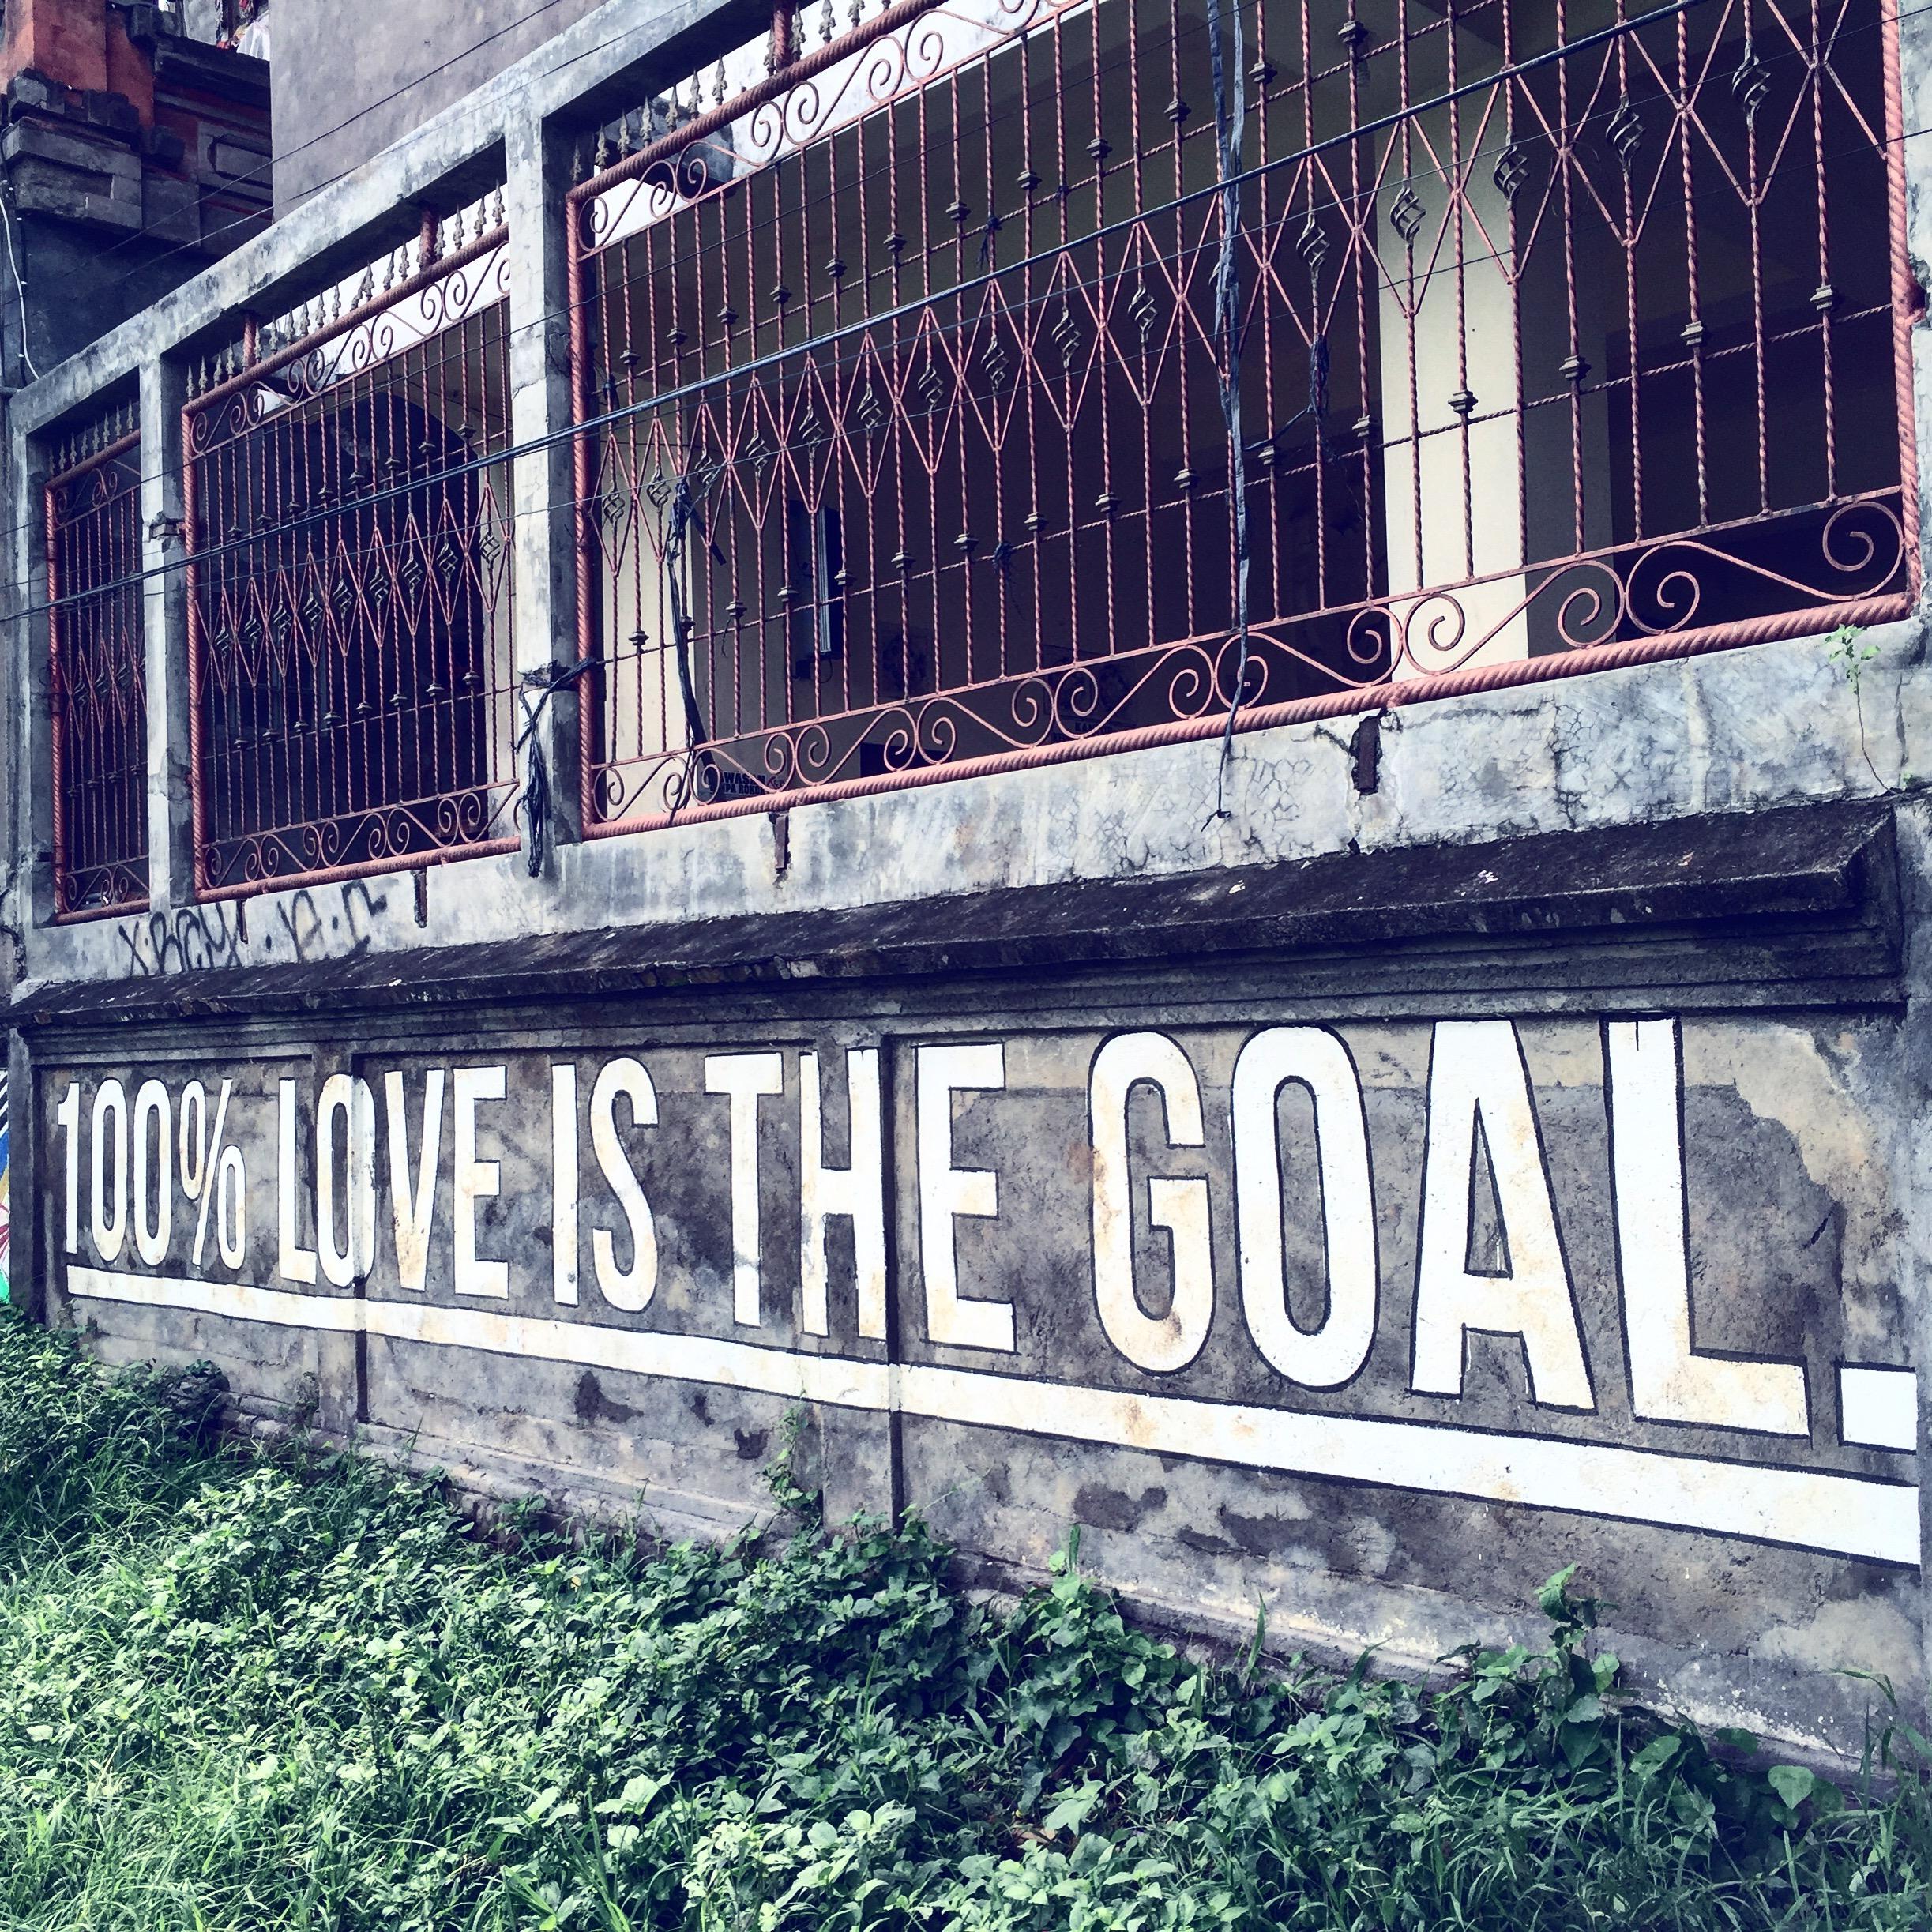 Wall art near the market in Ubud, Bali.